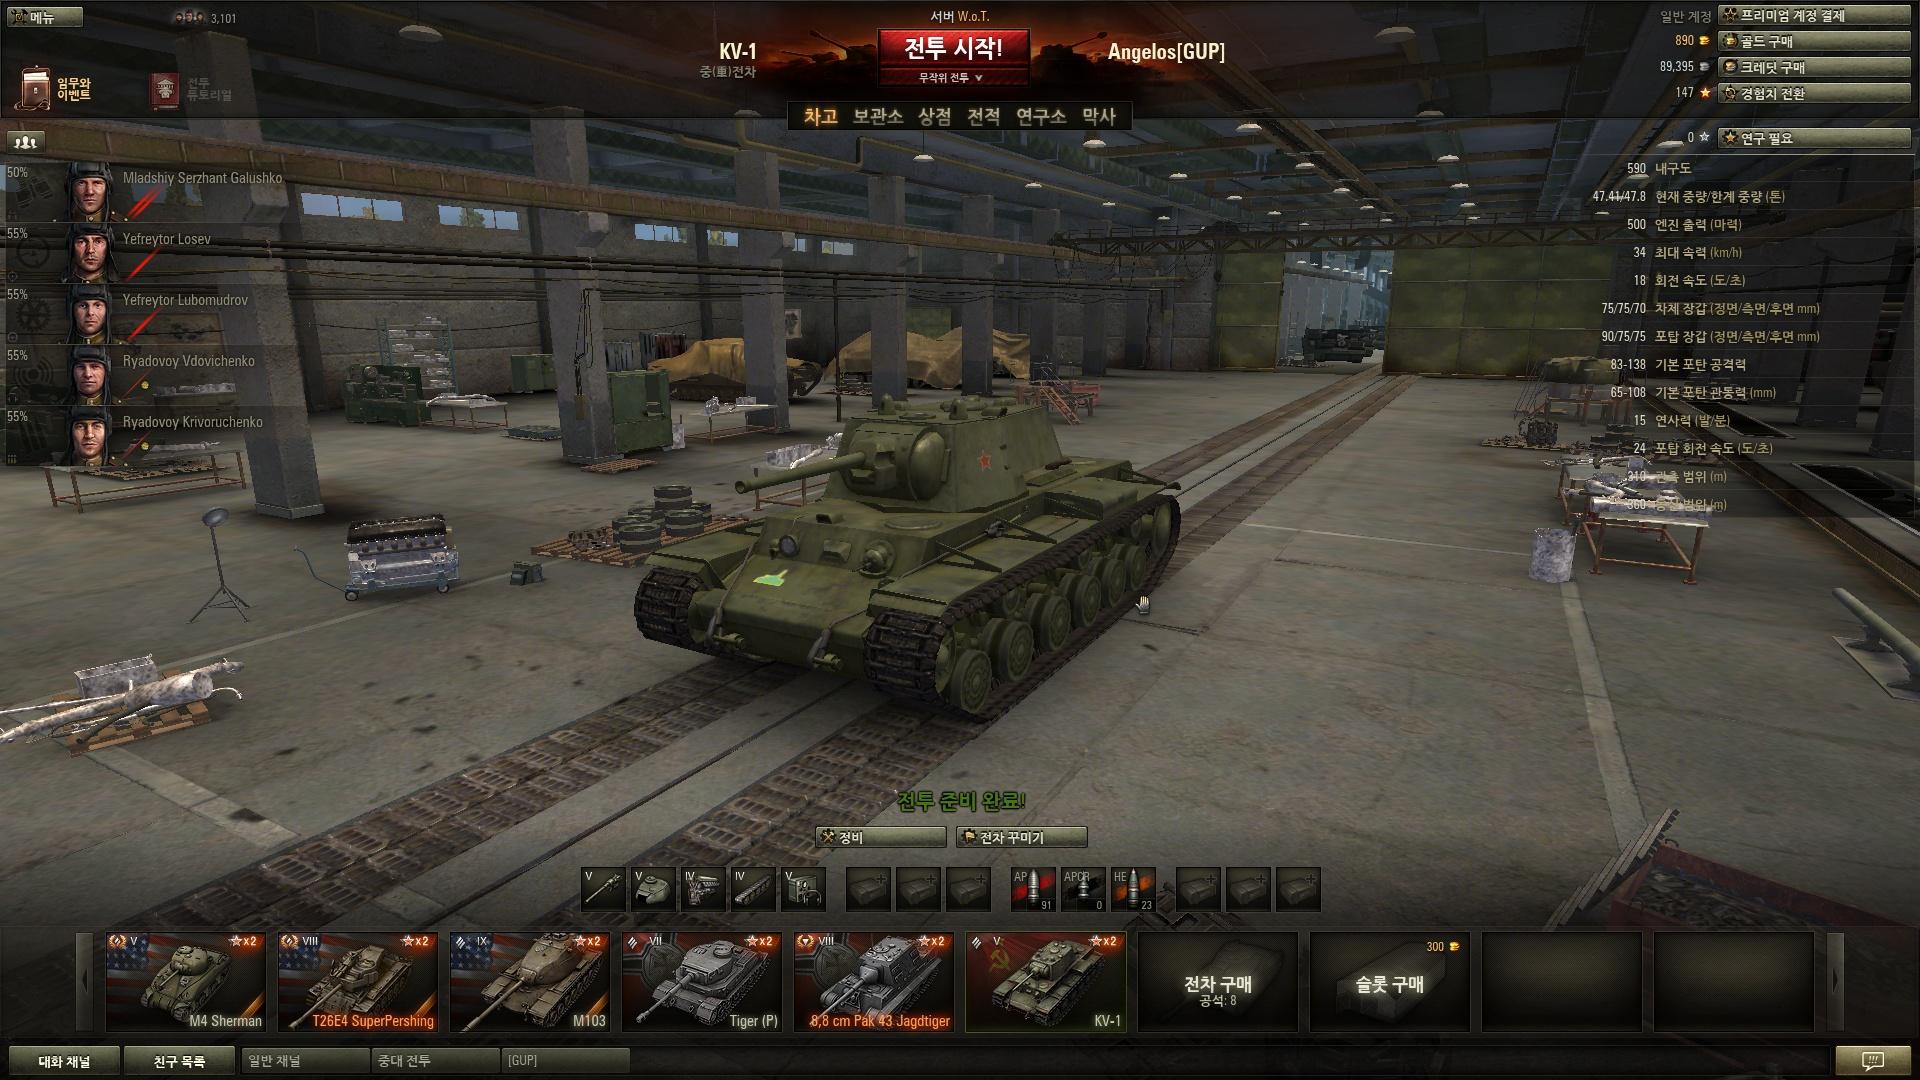 [WoT]...확실히 제가 소련 체질이긴 한 모양..